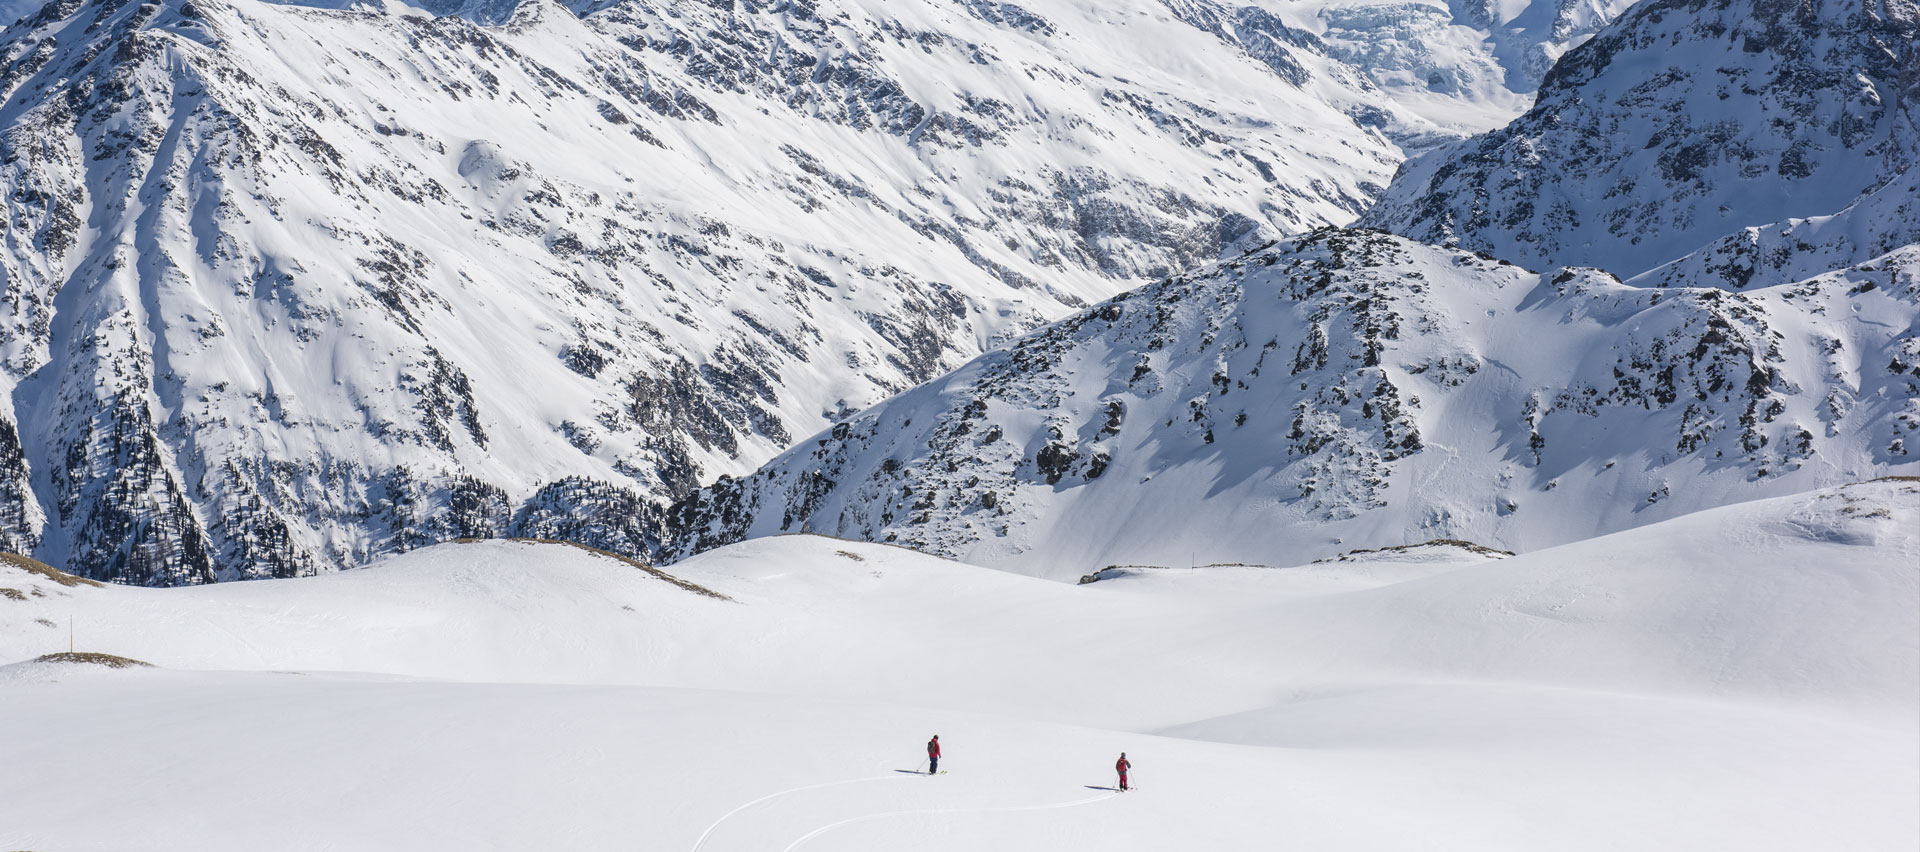 heli-snowboard-safari-winter